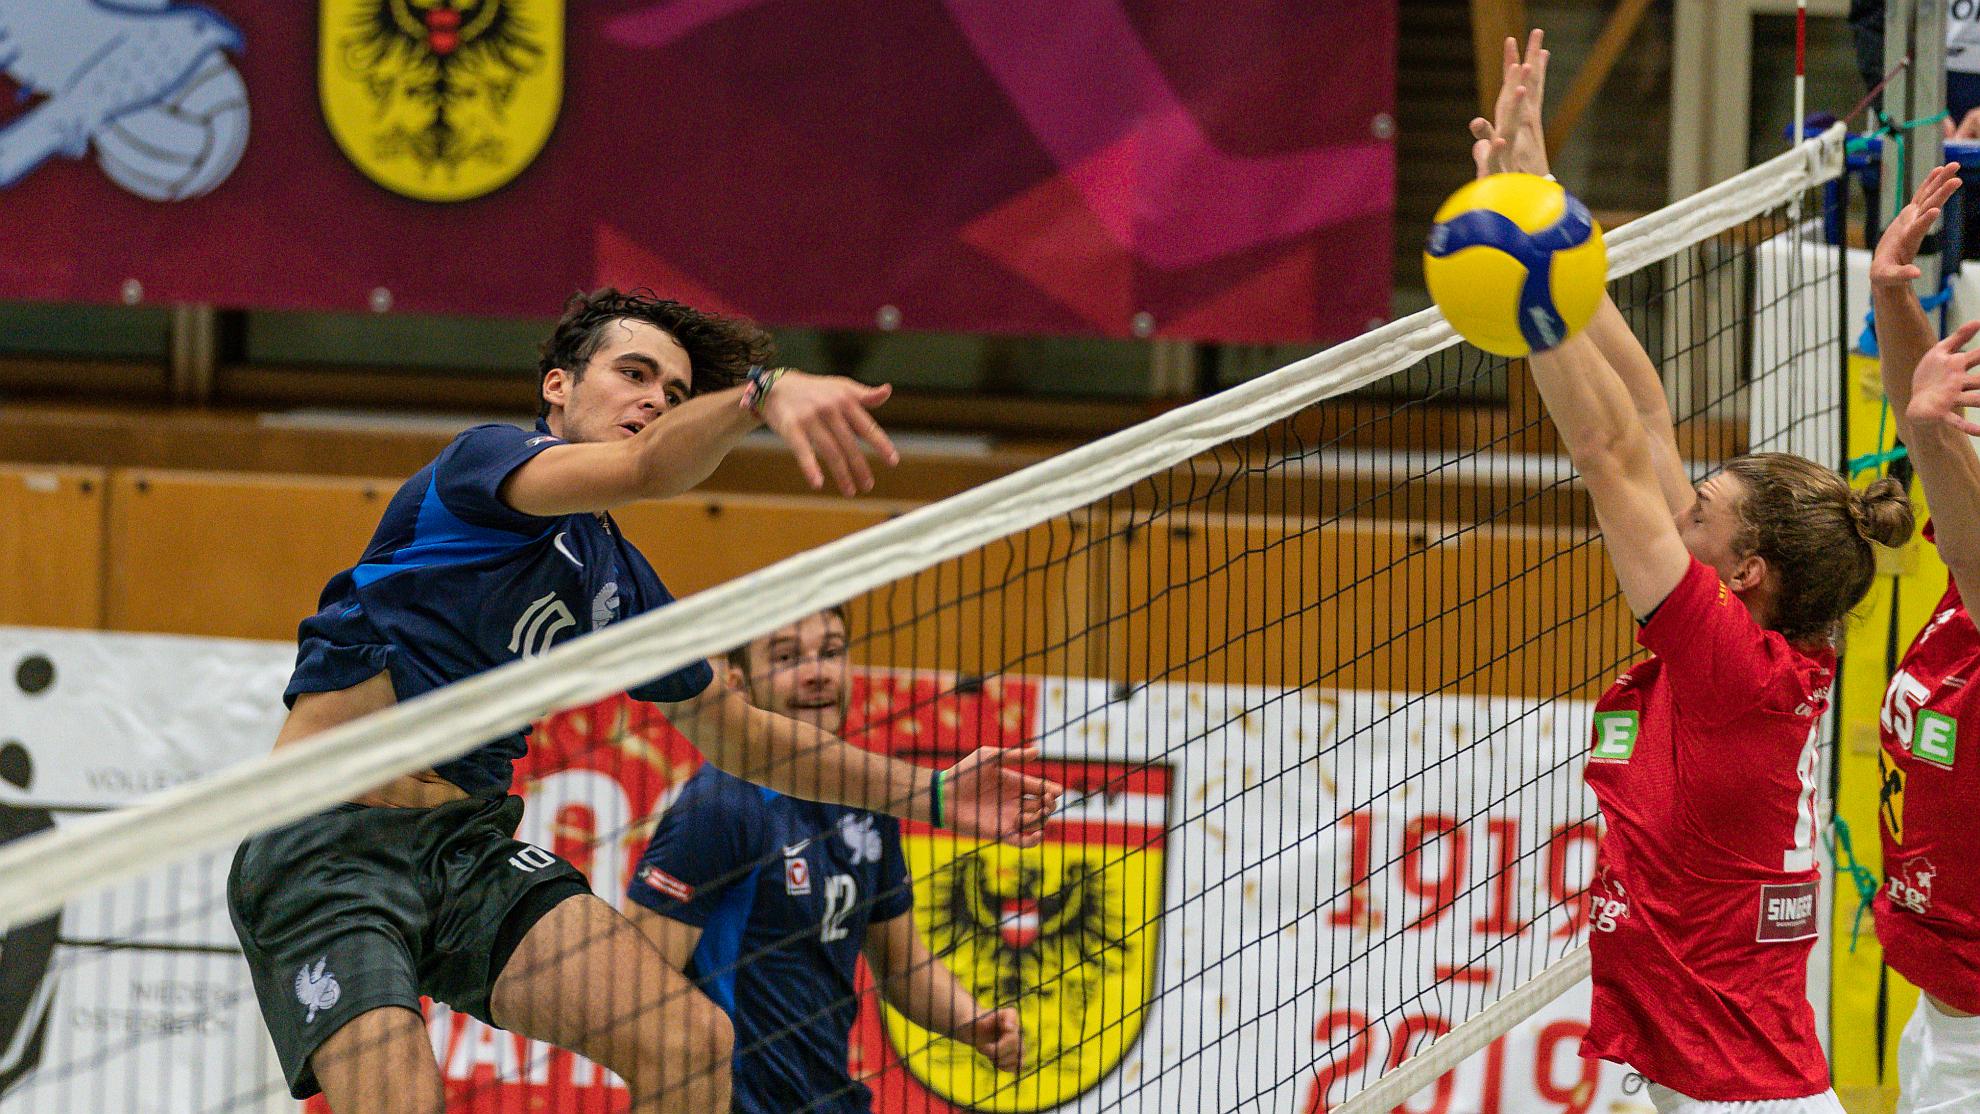 FOTO © GEPA pictures/Johannes Friedl